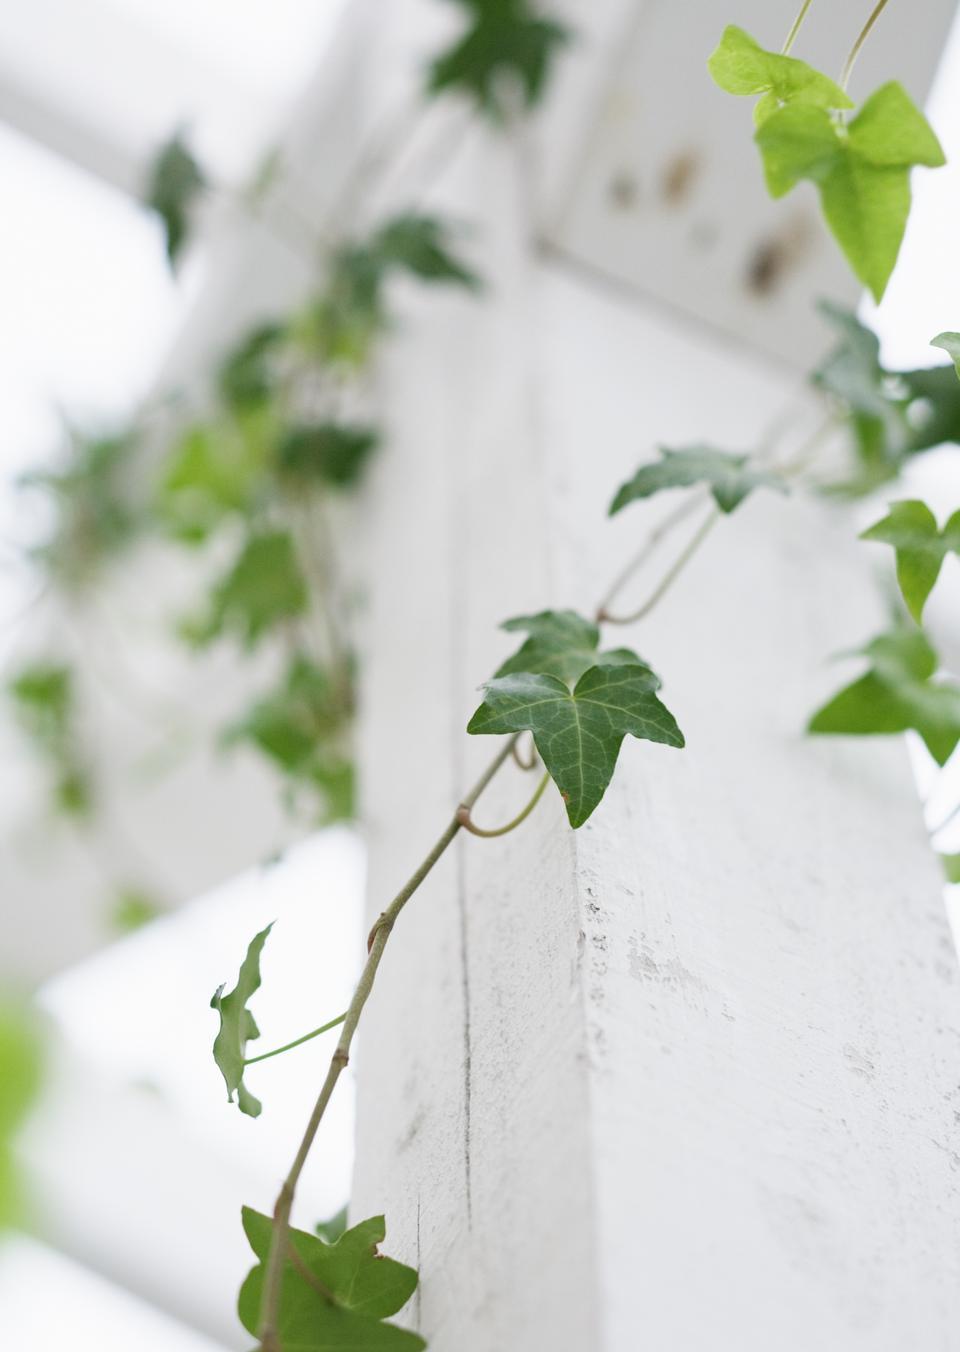 ivy on wood - Background